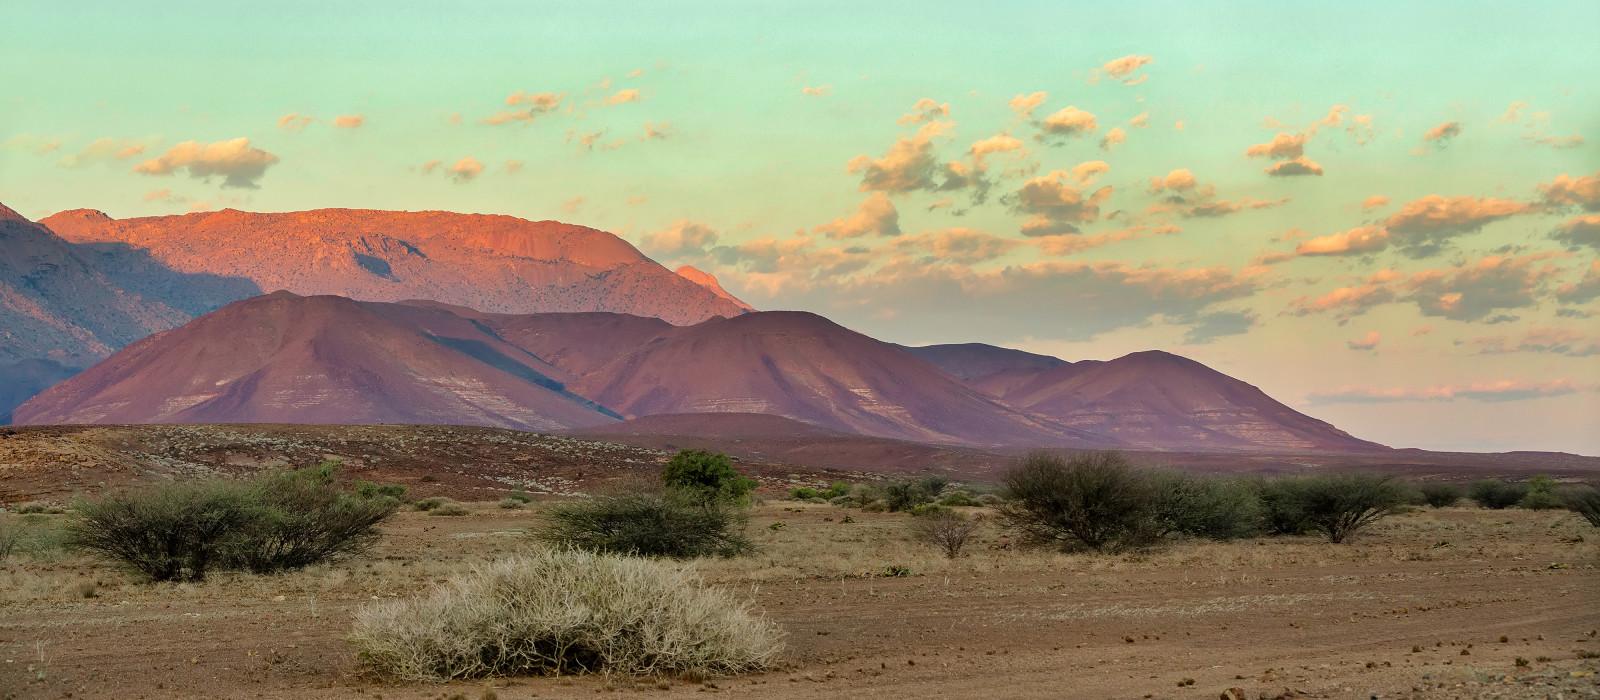 Destination Damaraland (Brandberg and Spitzkoppe) Namibia